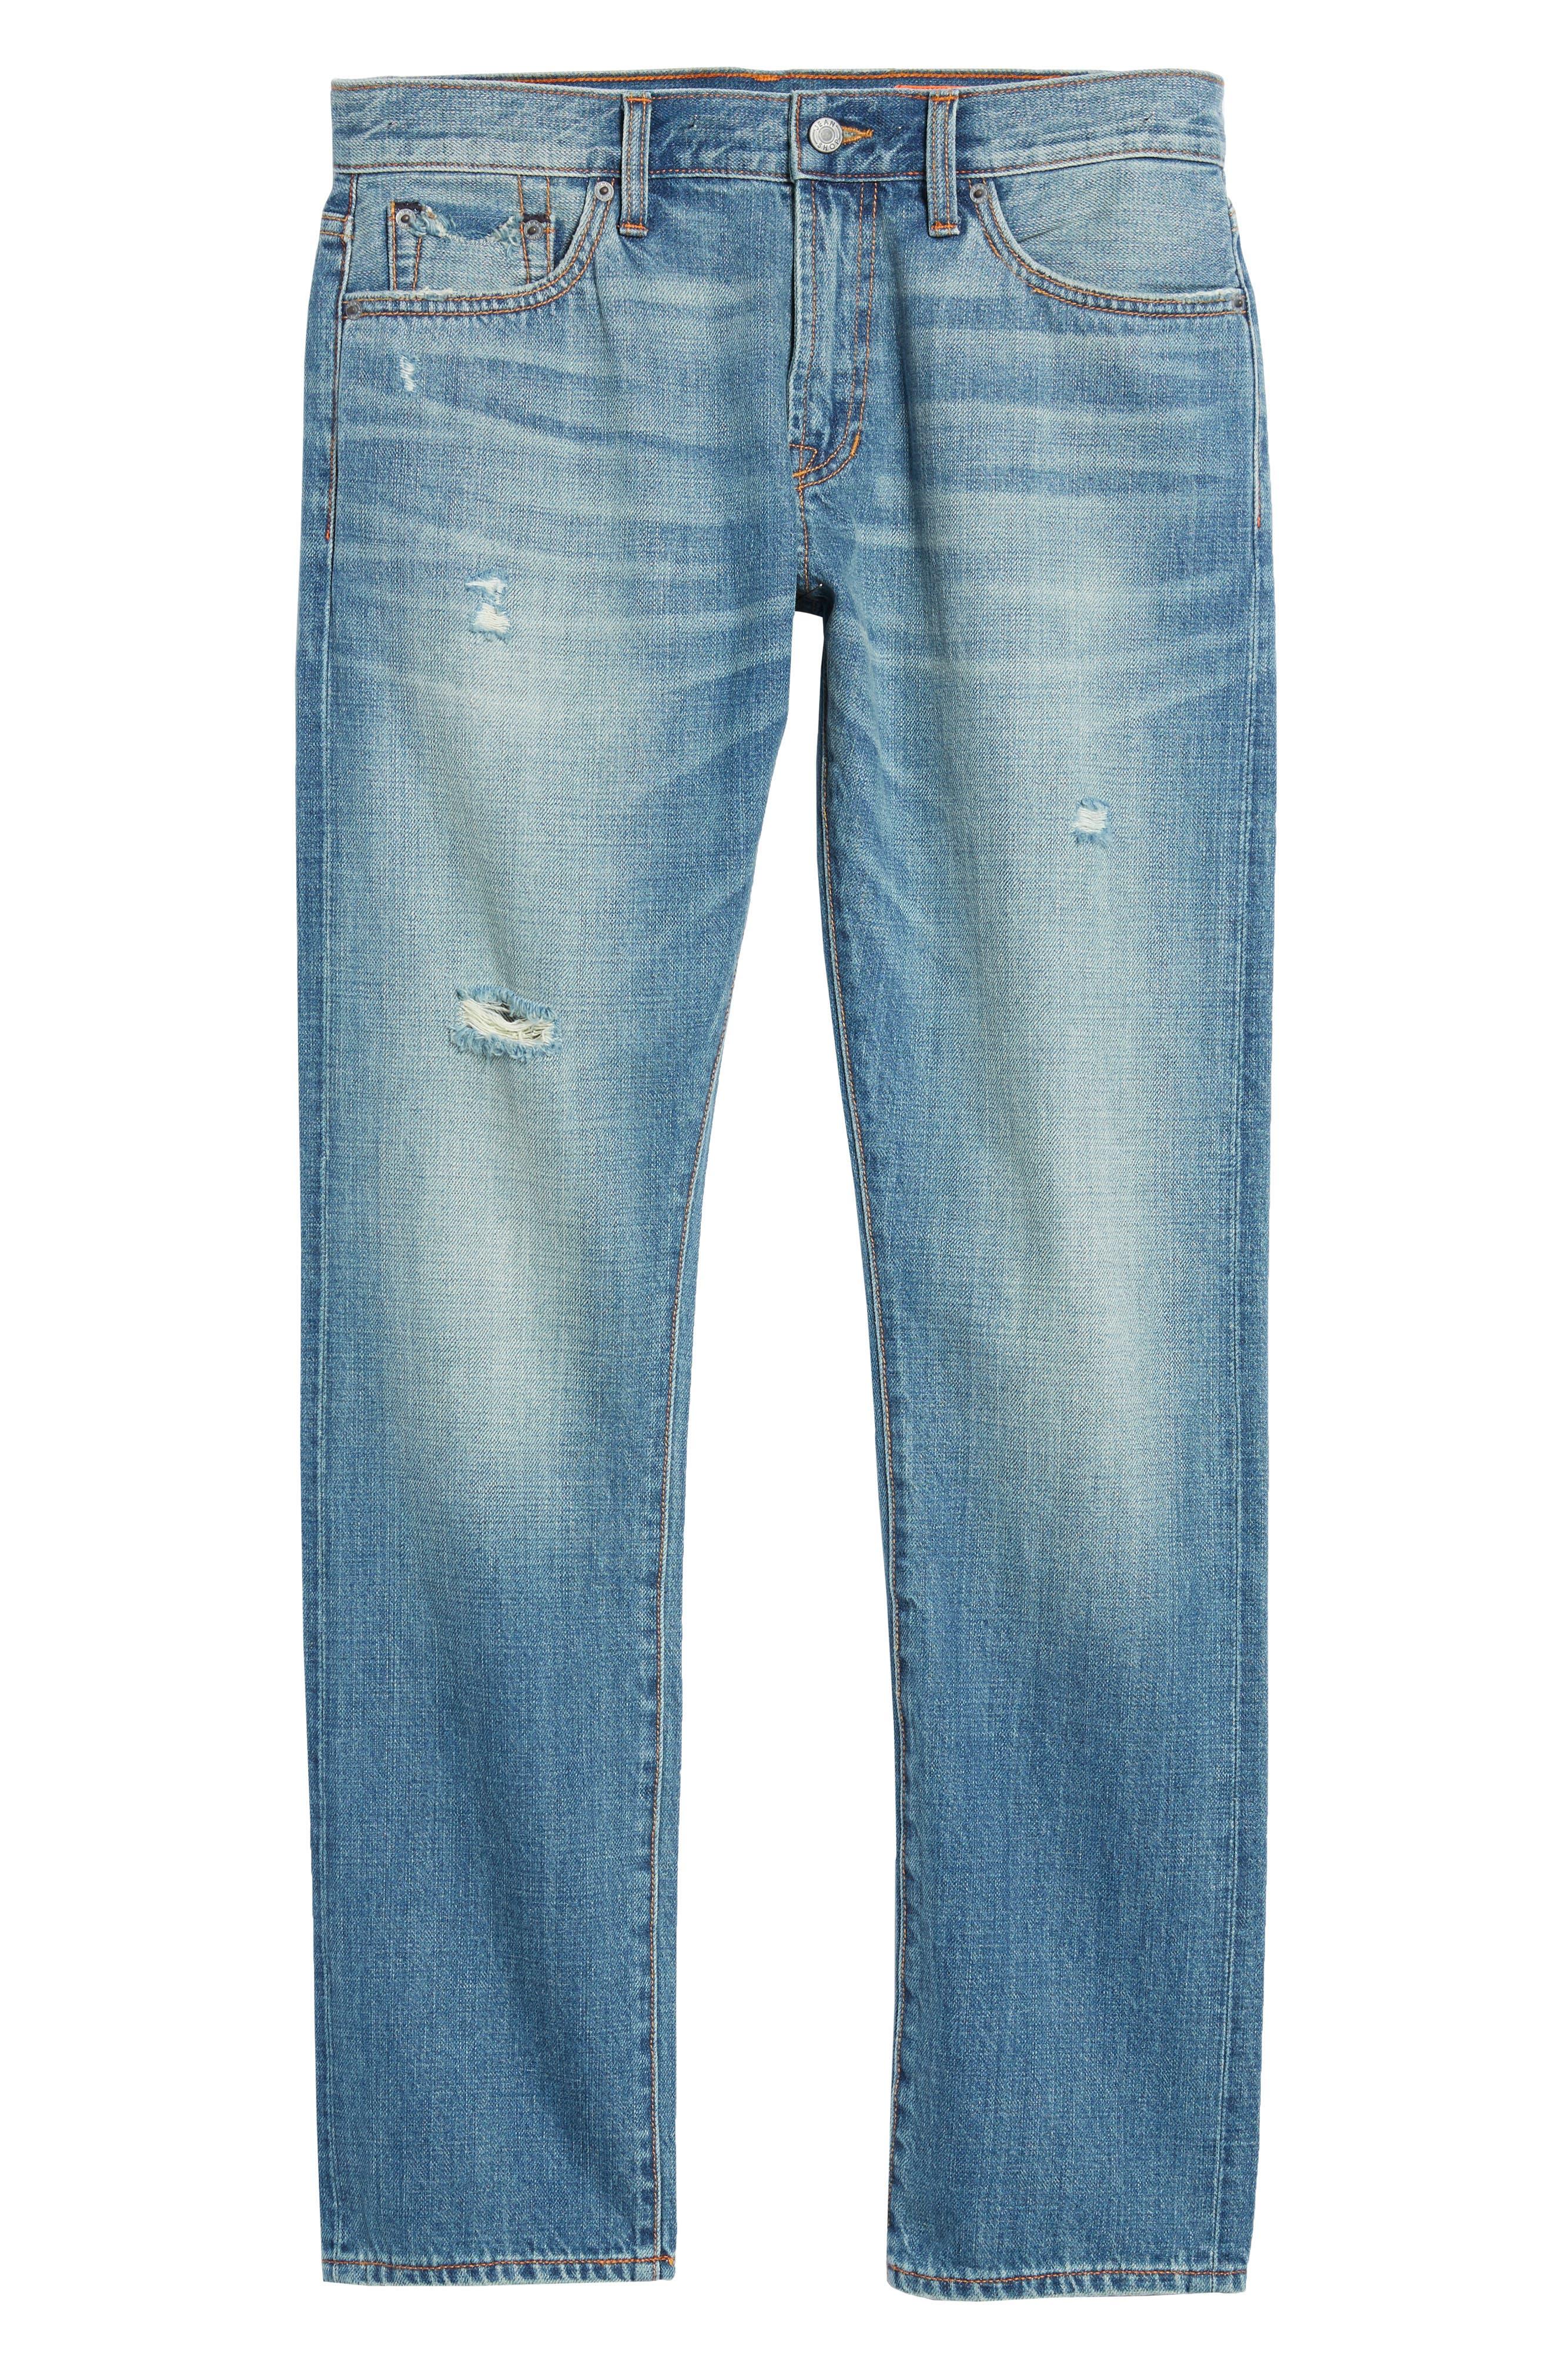 Mick Slim Straight Leg Jeans,                             Alternate thumbnail 6, color,                             ACCORD